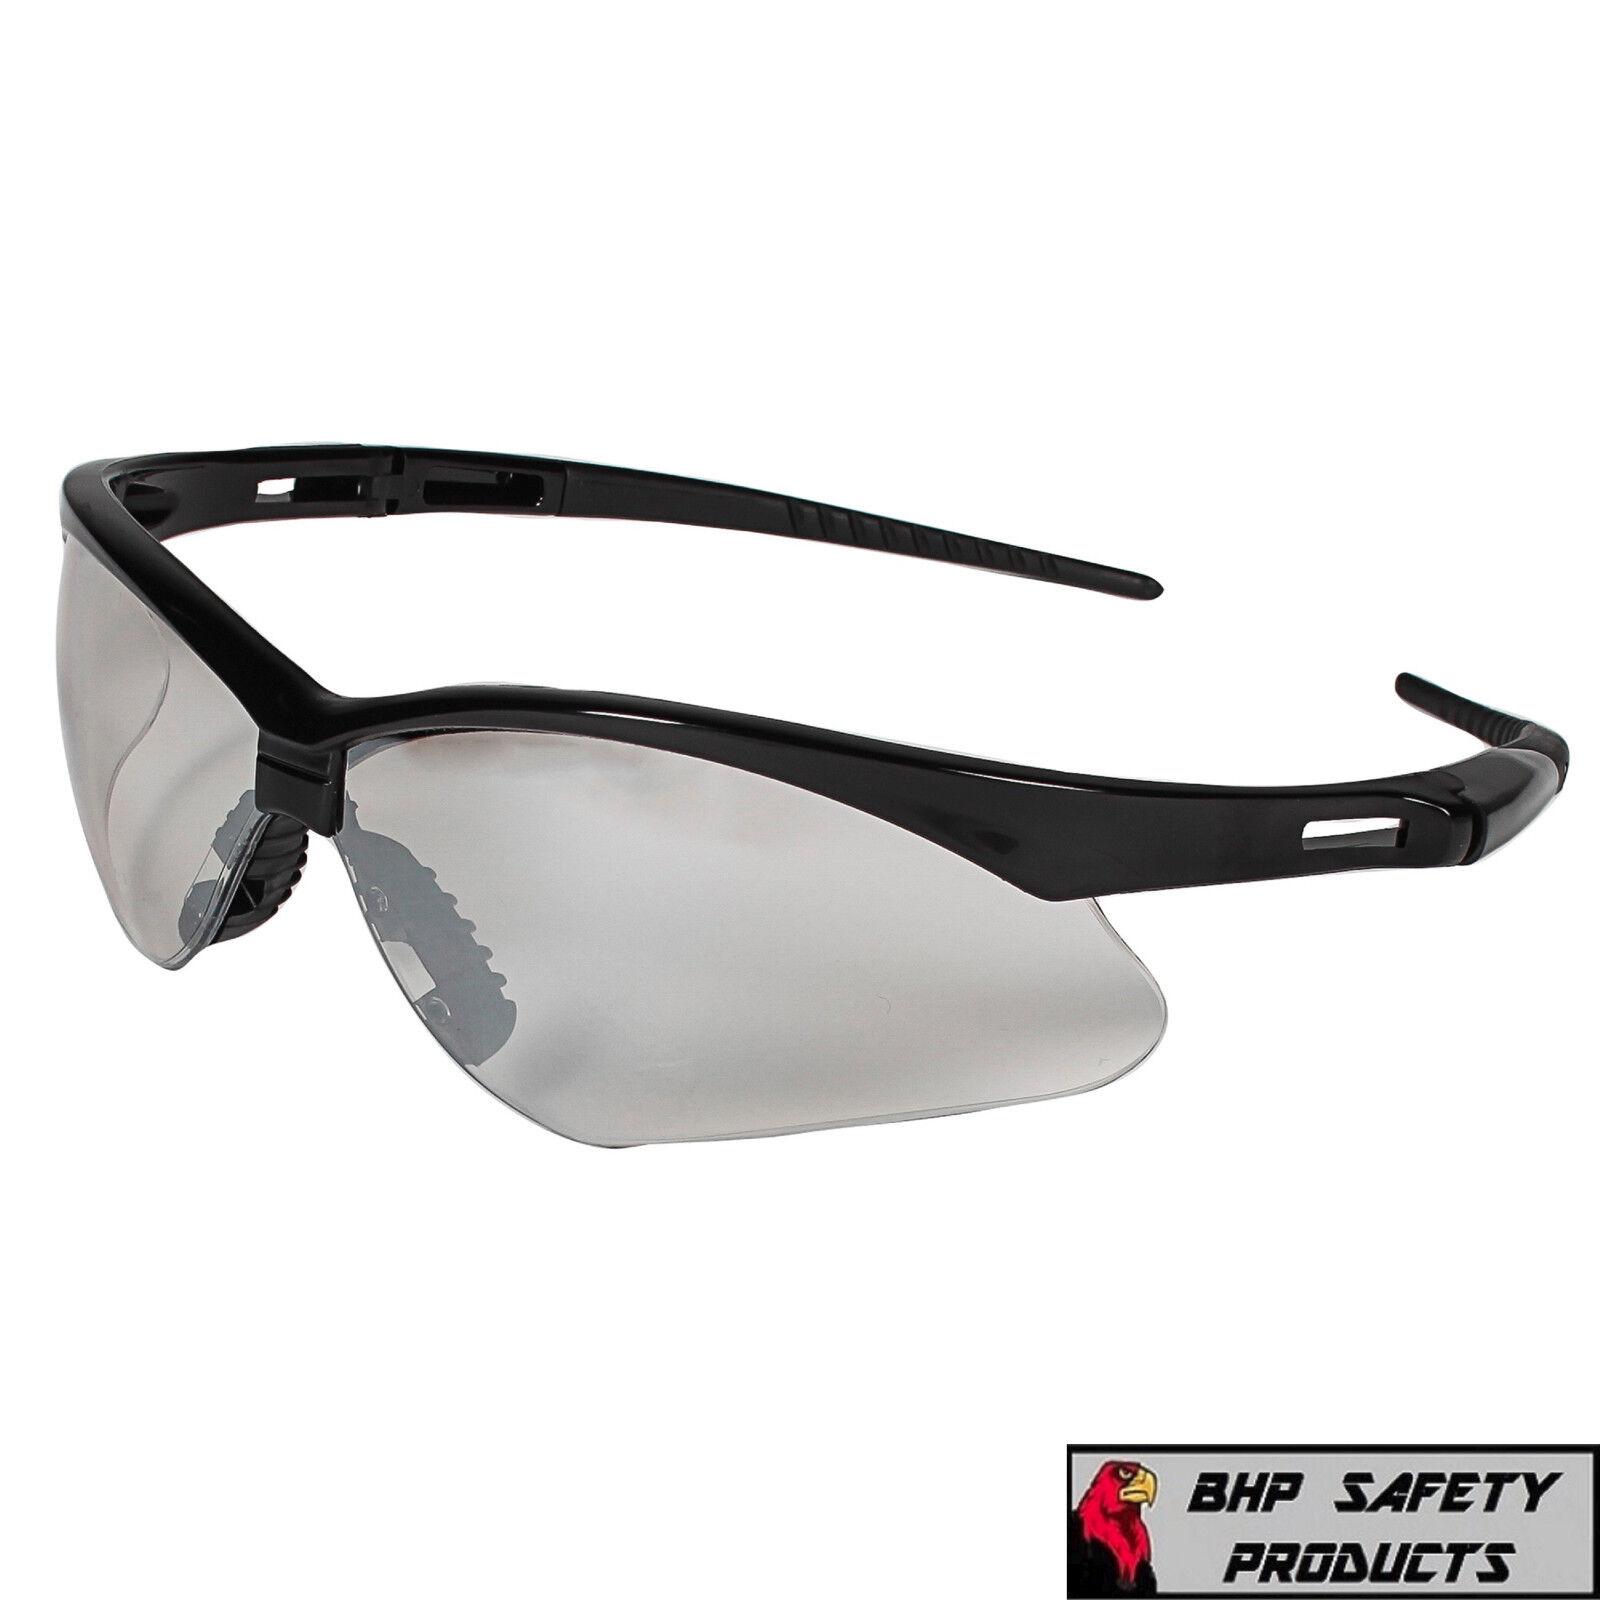 JACKSON NEMESIS SAFETY GLASSES SUNGLASSES SPORT WORK EYEWEAR ANSI Z87 COMPLIANT 25685- Black Frame/I-O Mirror Lens